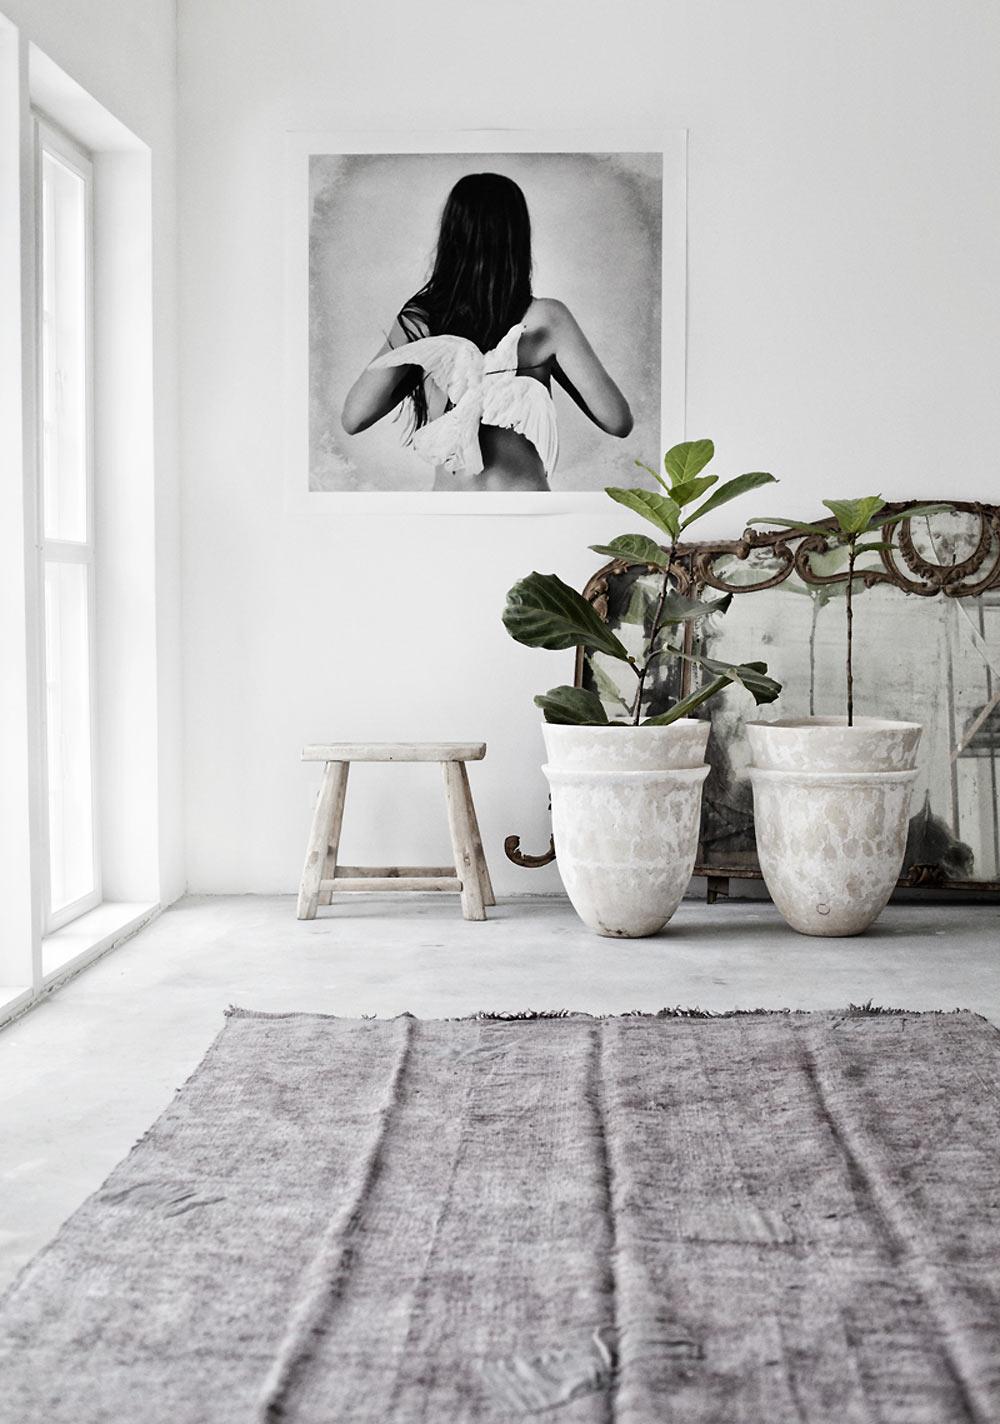 Marie Olsson Nylander Home House Inspiration white interior bedroom bathroom dining room natural white timber concrete light outdoor